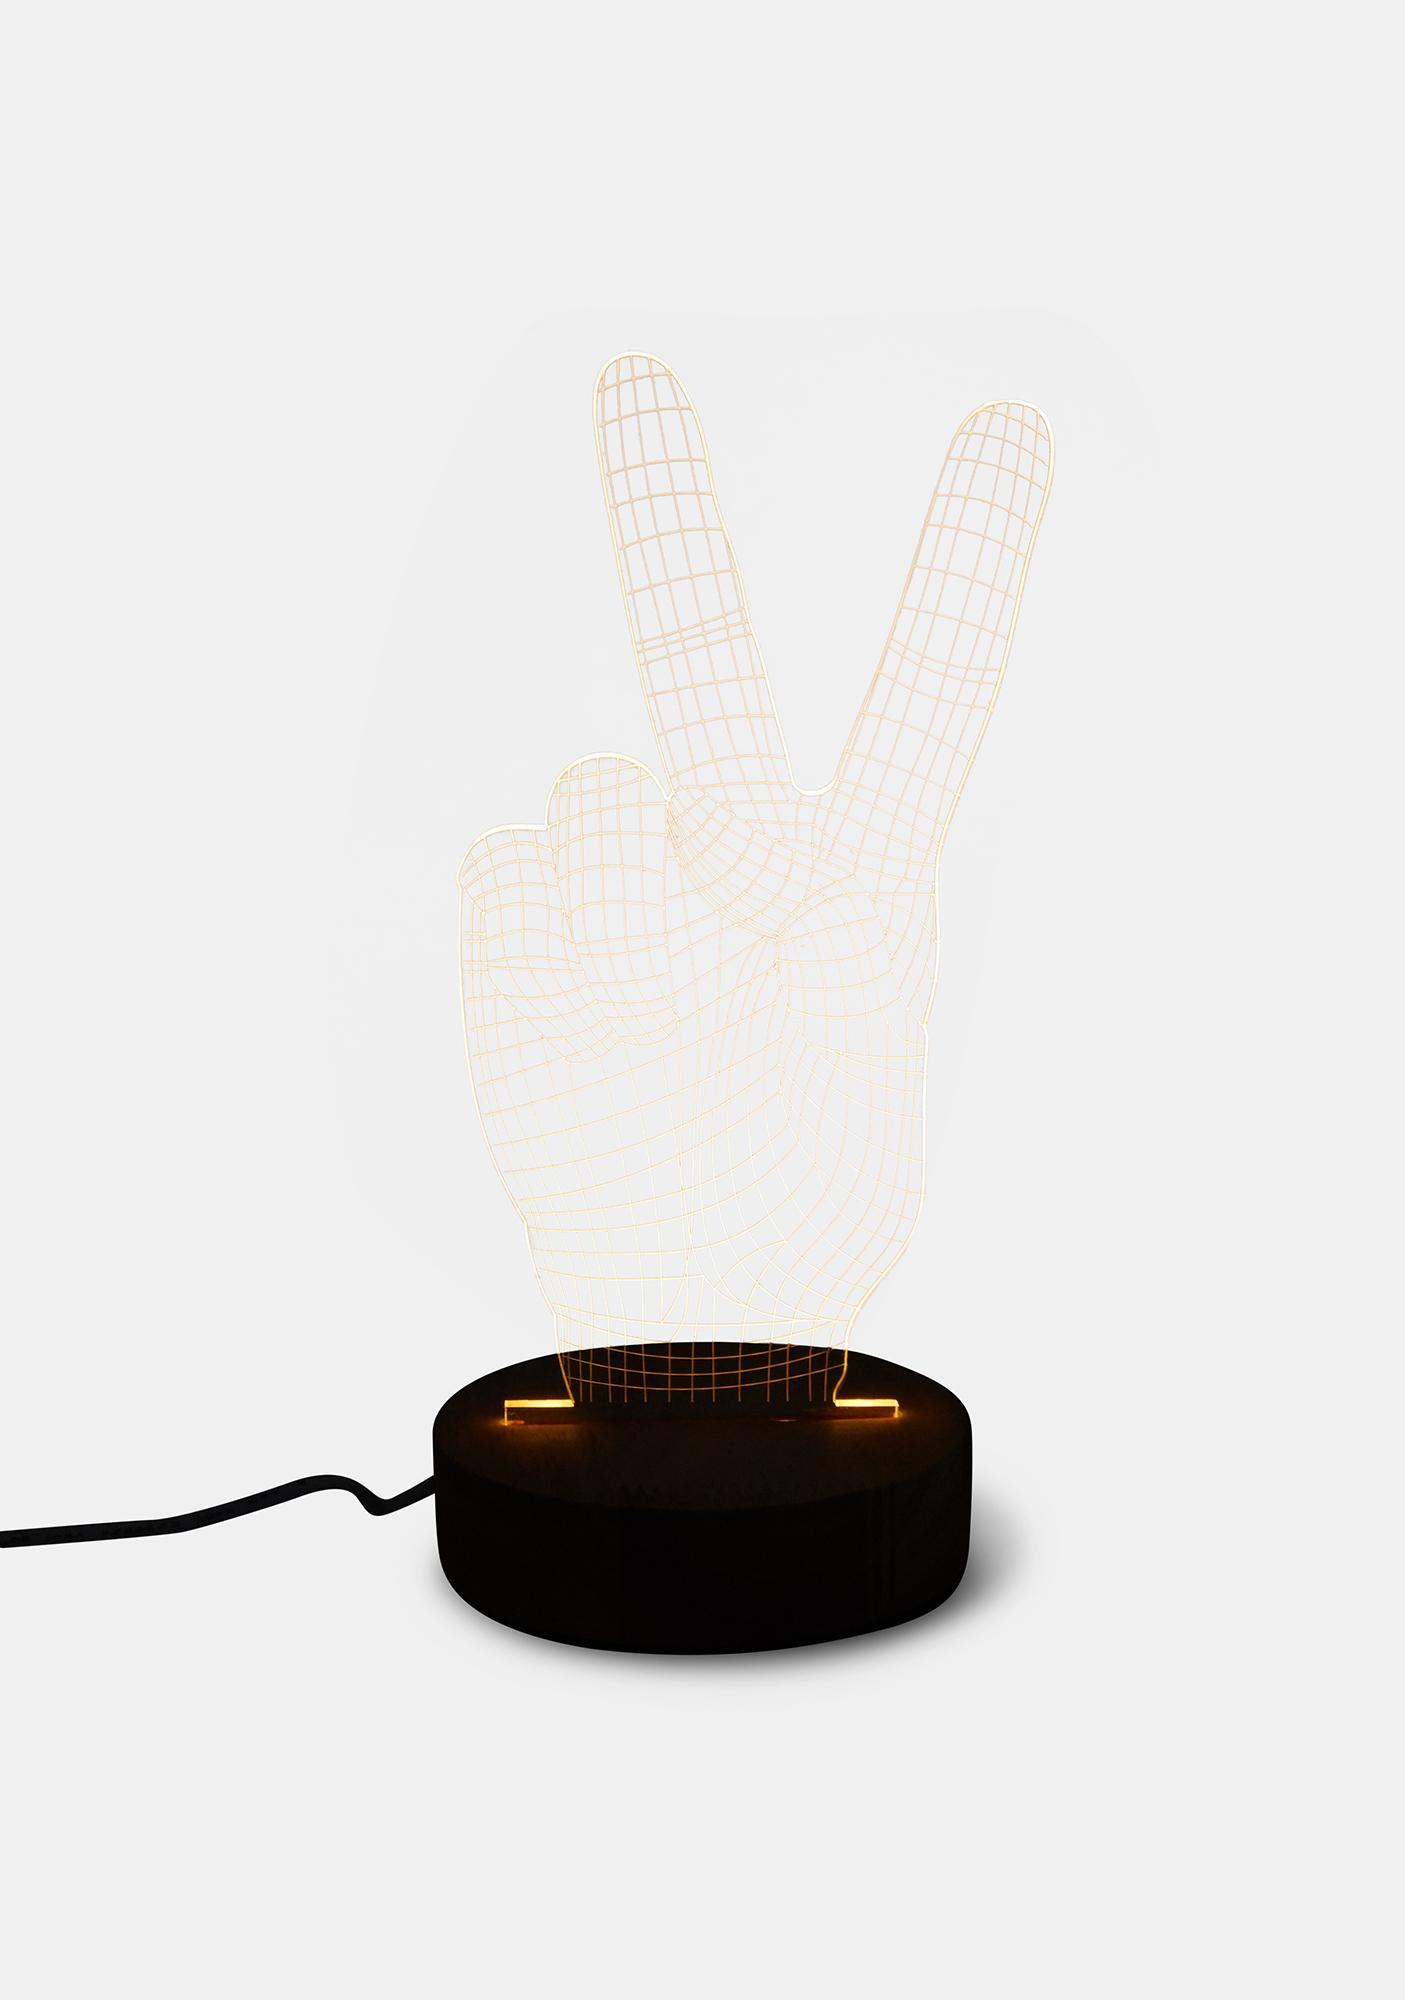 Amped & Co Peace 3D Illusion Light